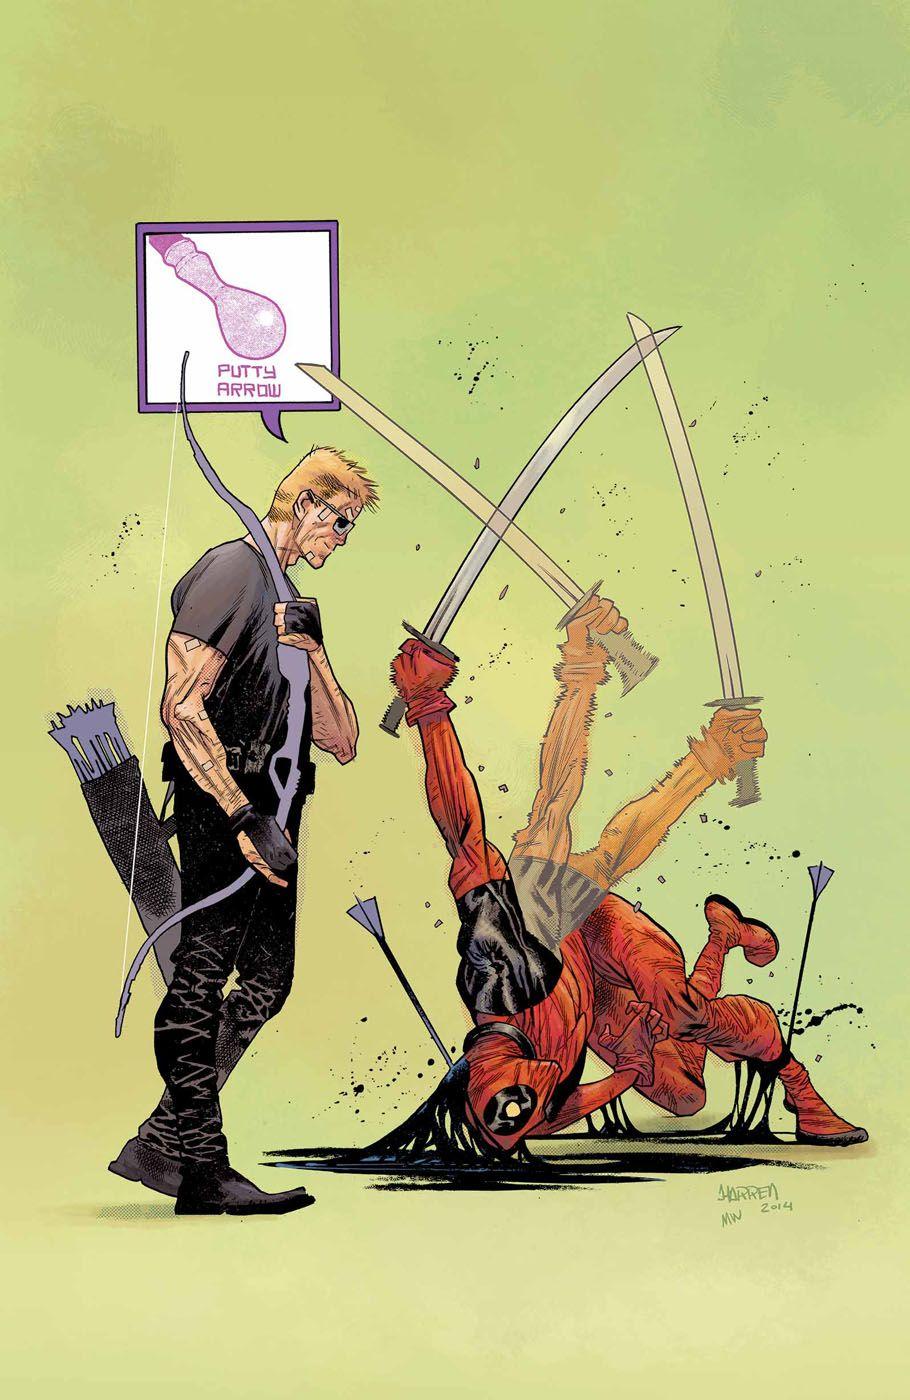 Hawkeye VS. Deadpool N°3 - Cover by James Harren